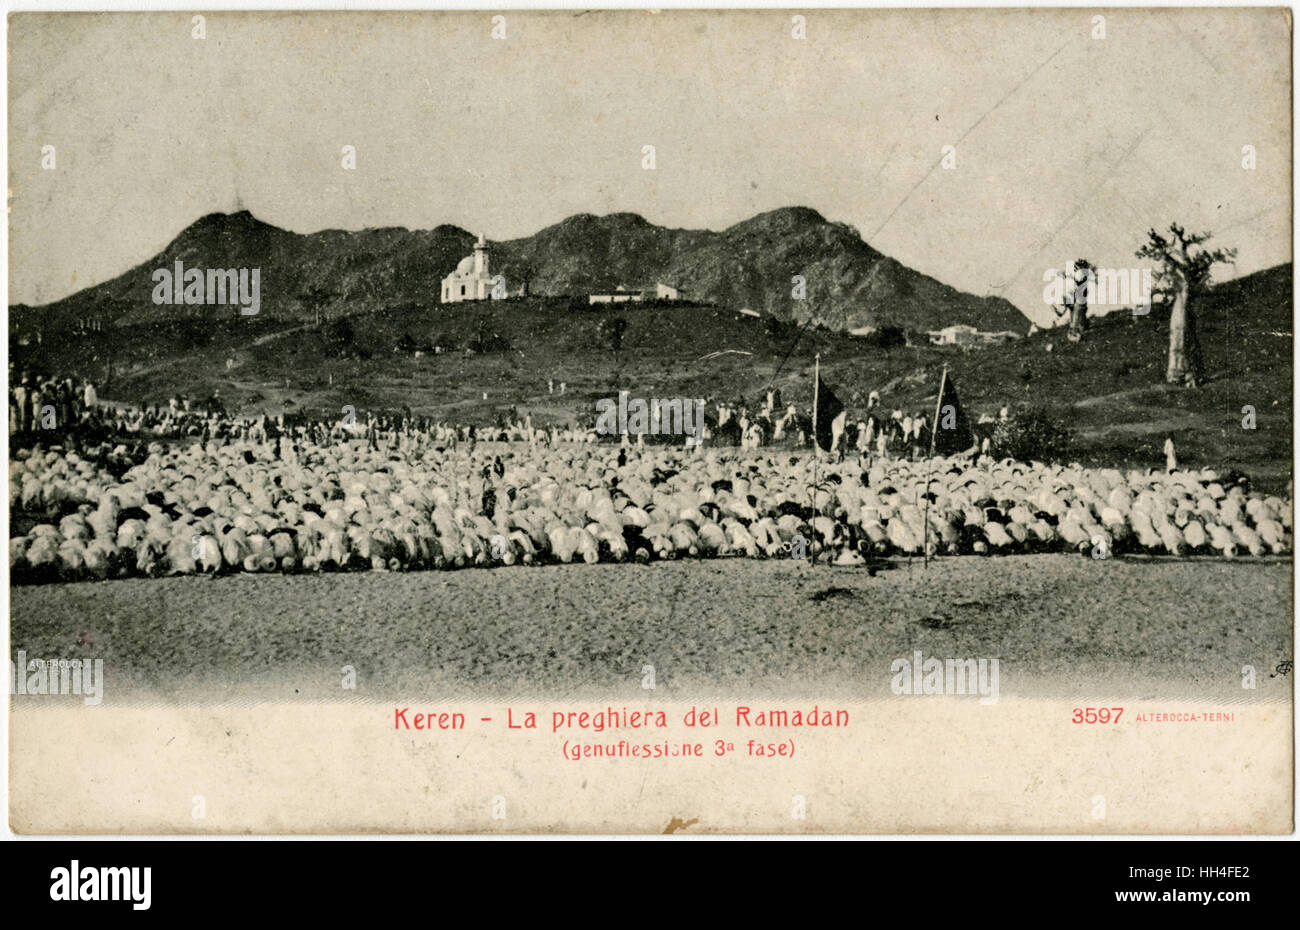 Kern, Eritrea - Ramadan Prayers - genuflection, third phase. - Stock Image